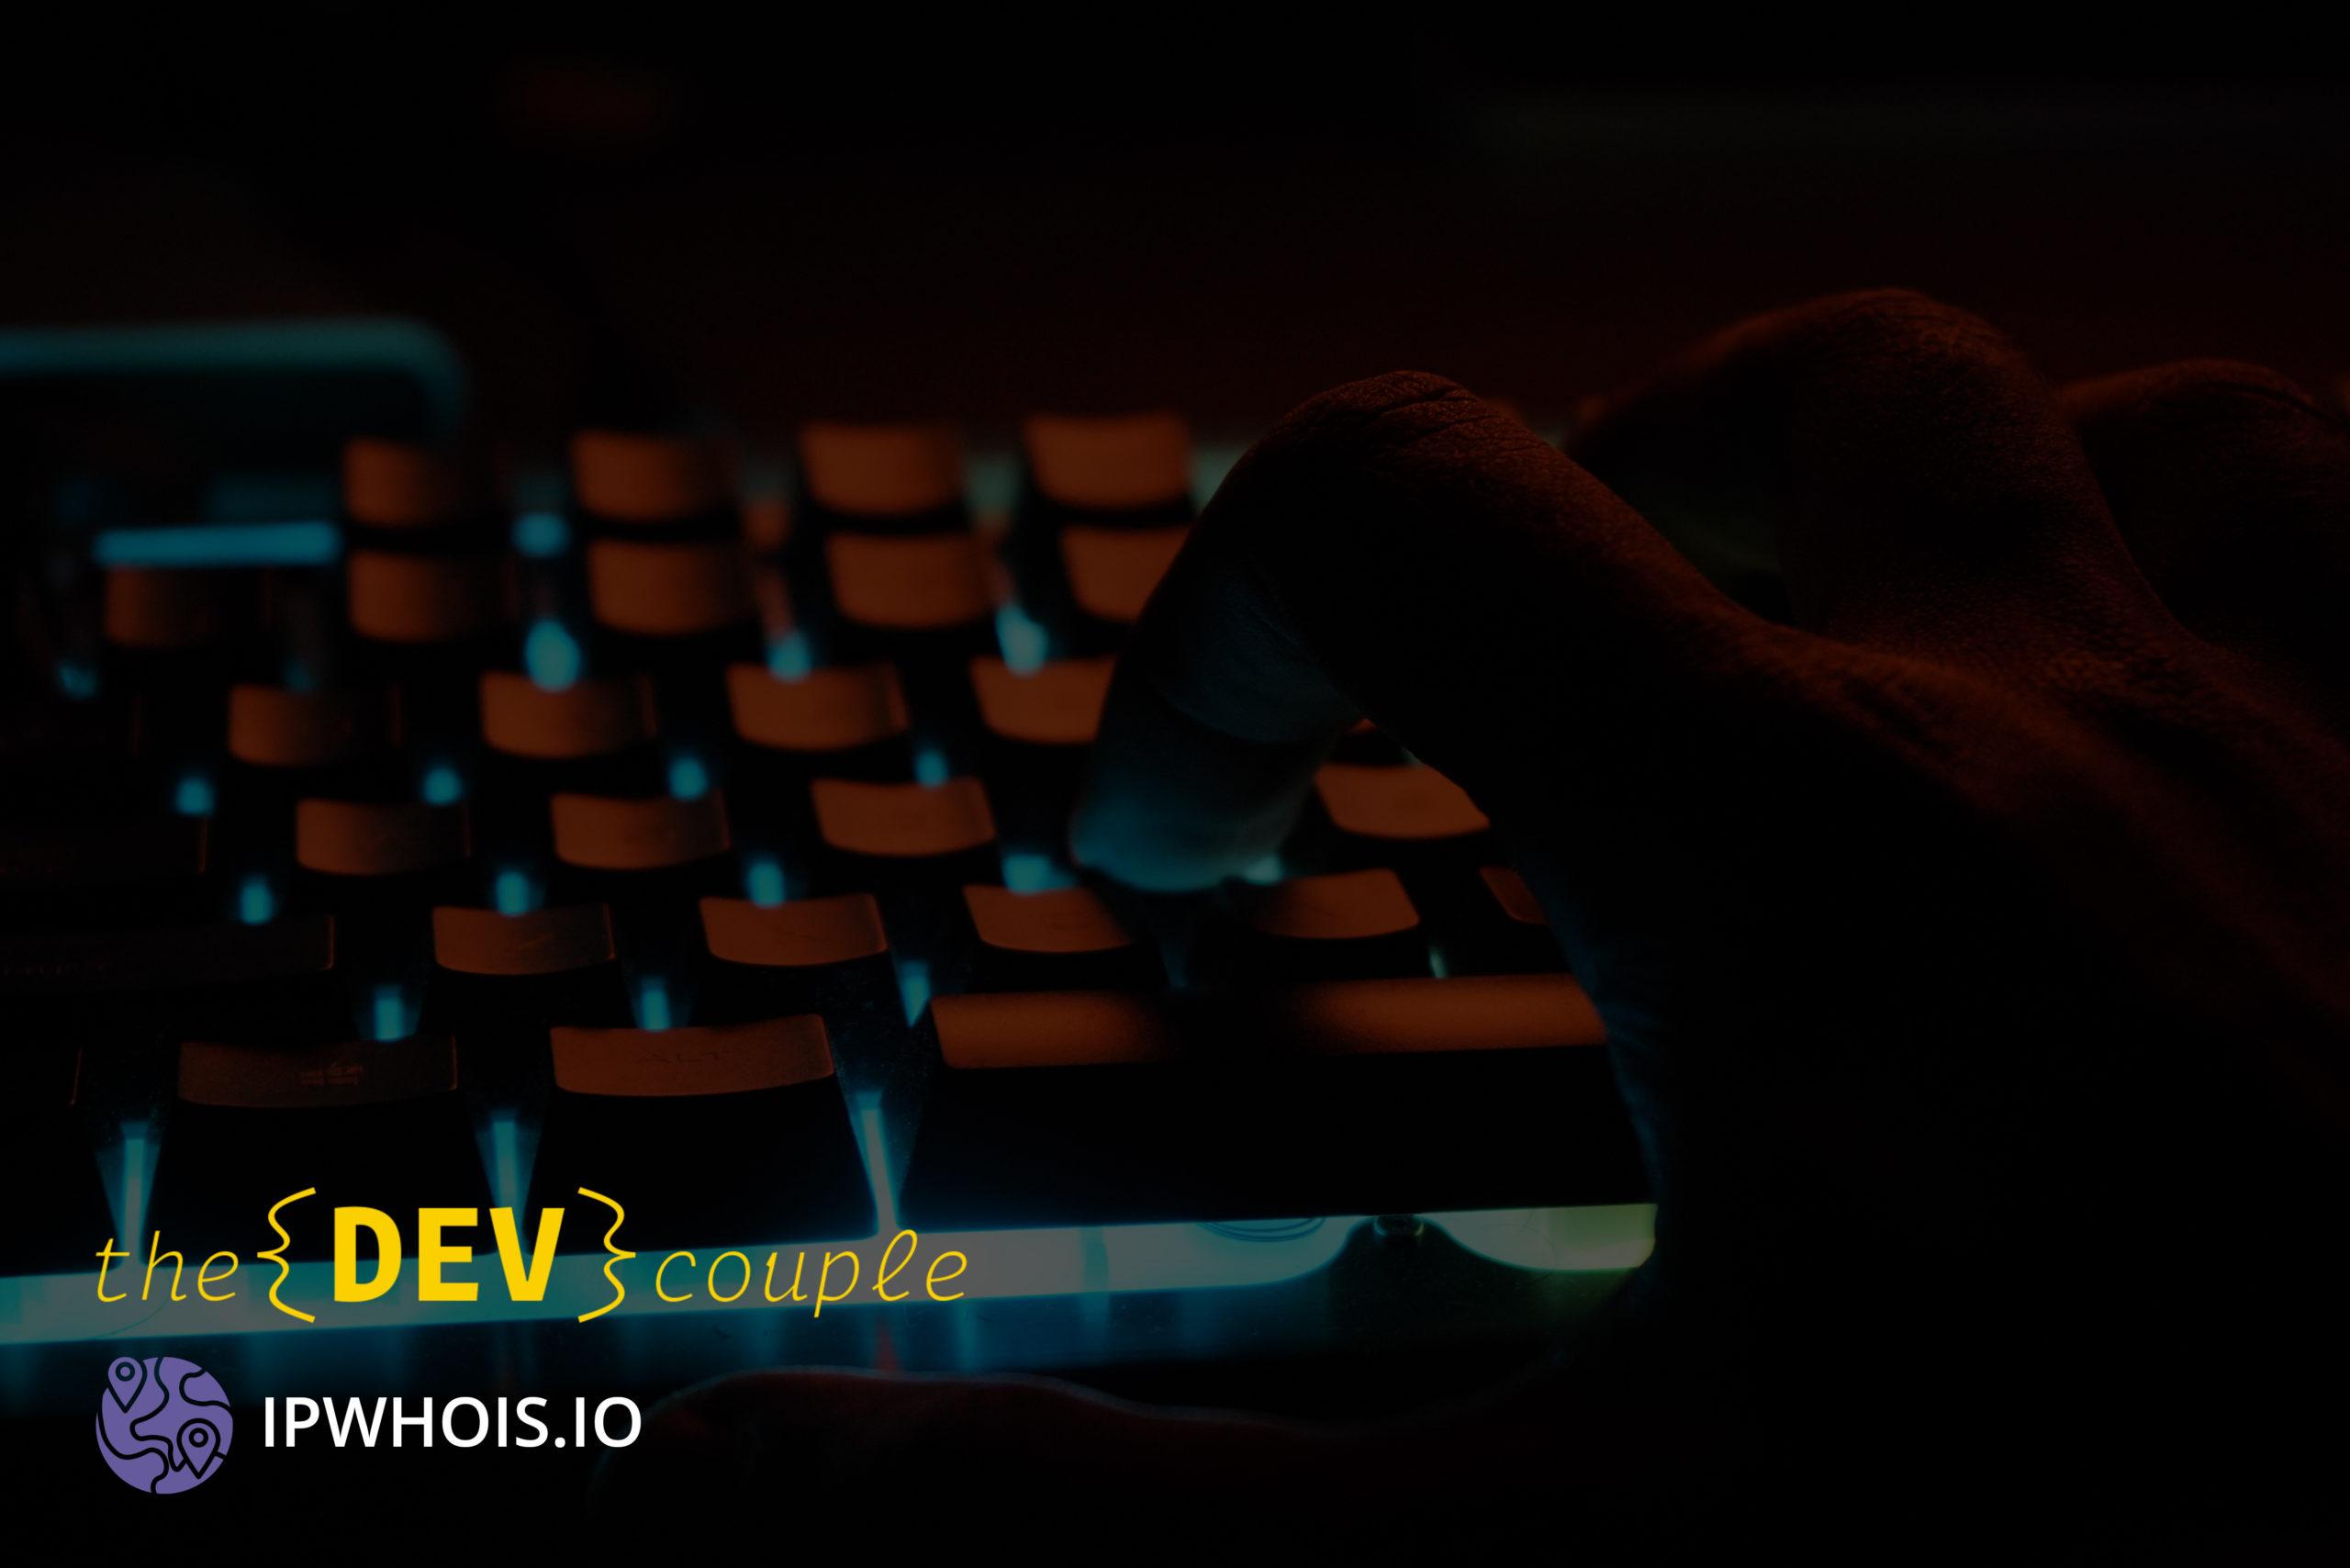 Ipwhois.io Cover Thedevcouple